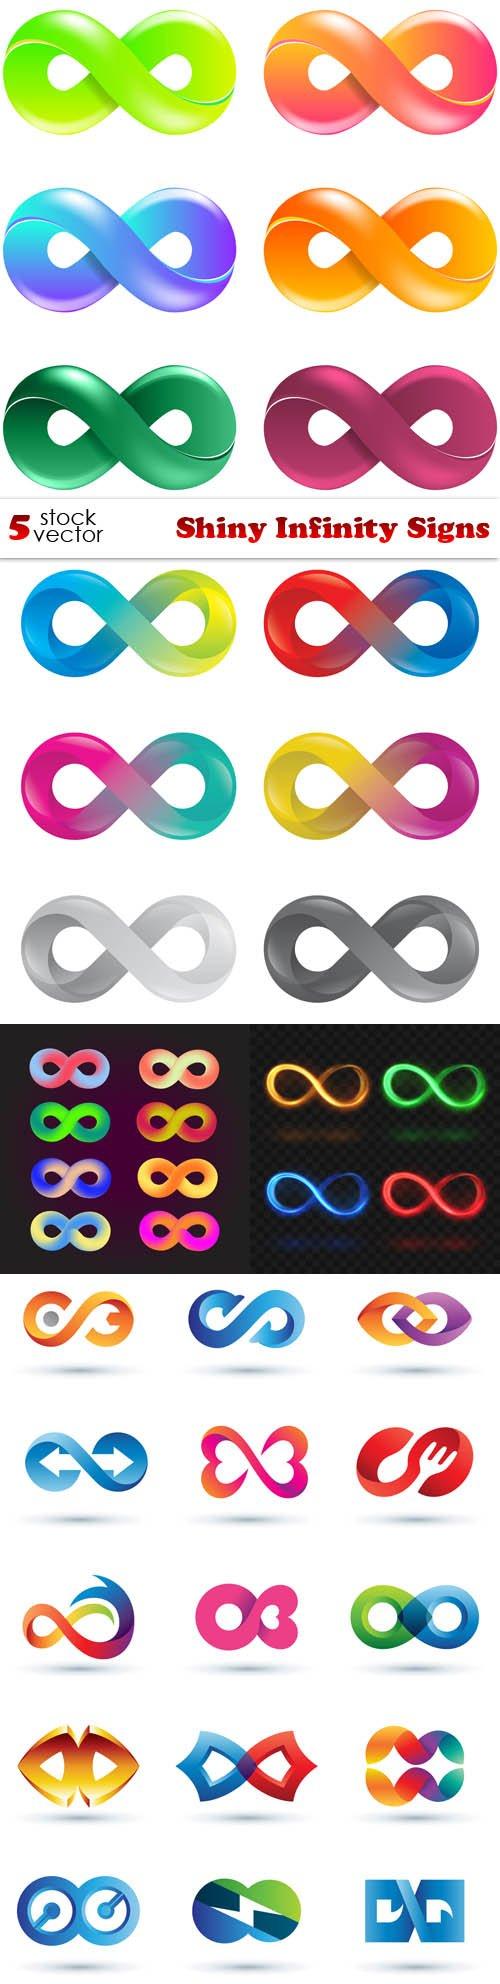 Vectors - Shiny Infinity Signs